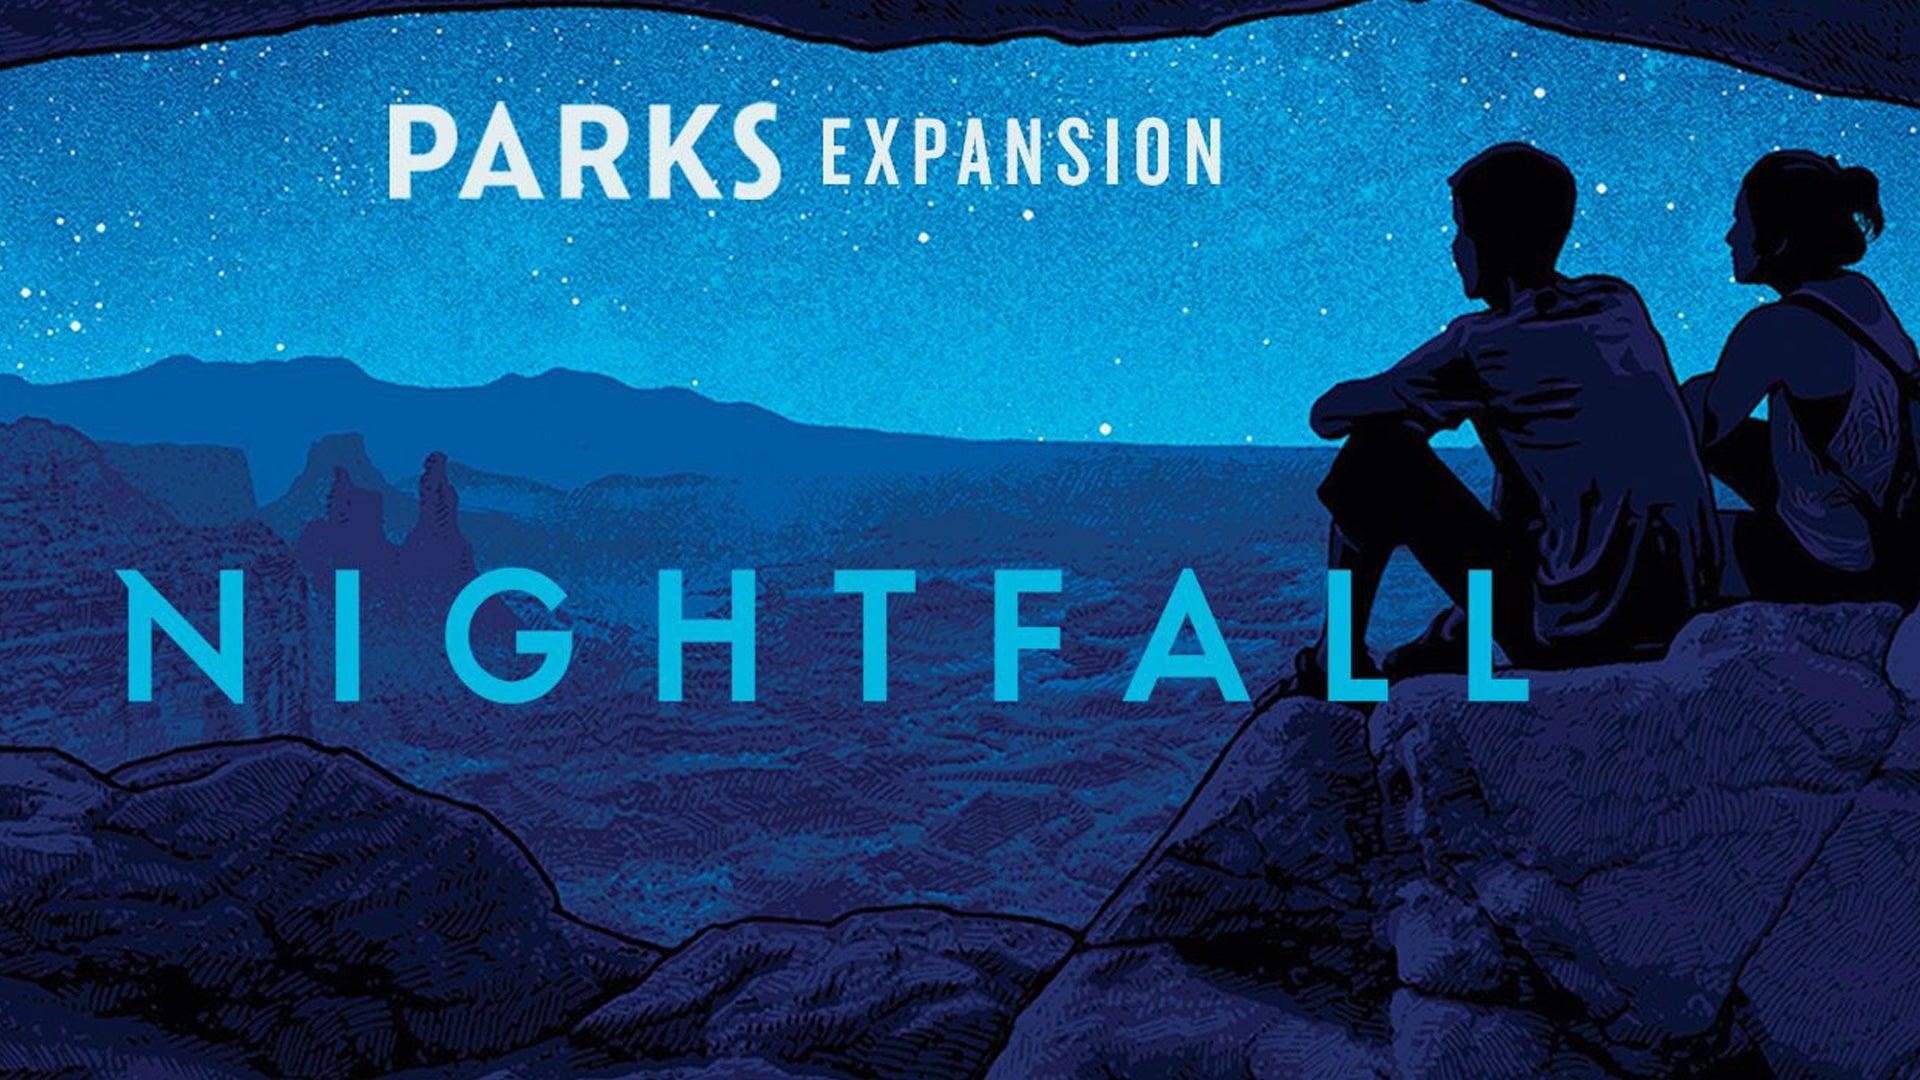 Parks: Nightfall board game artwork